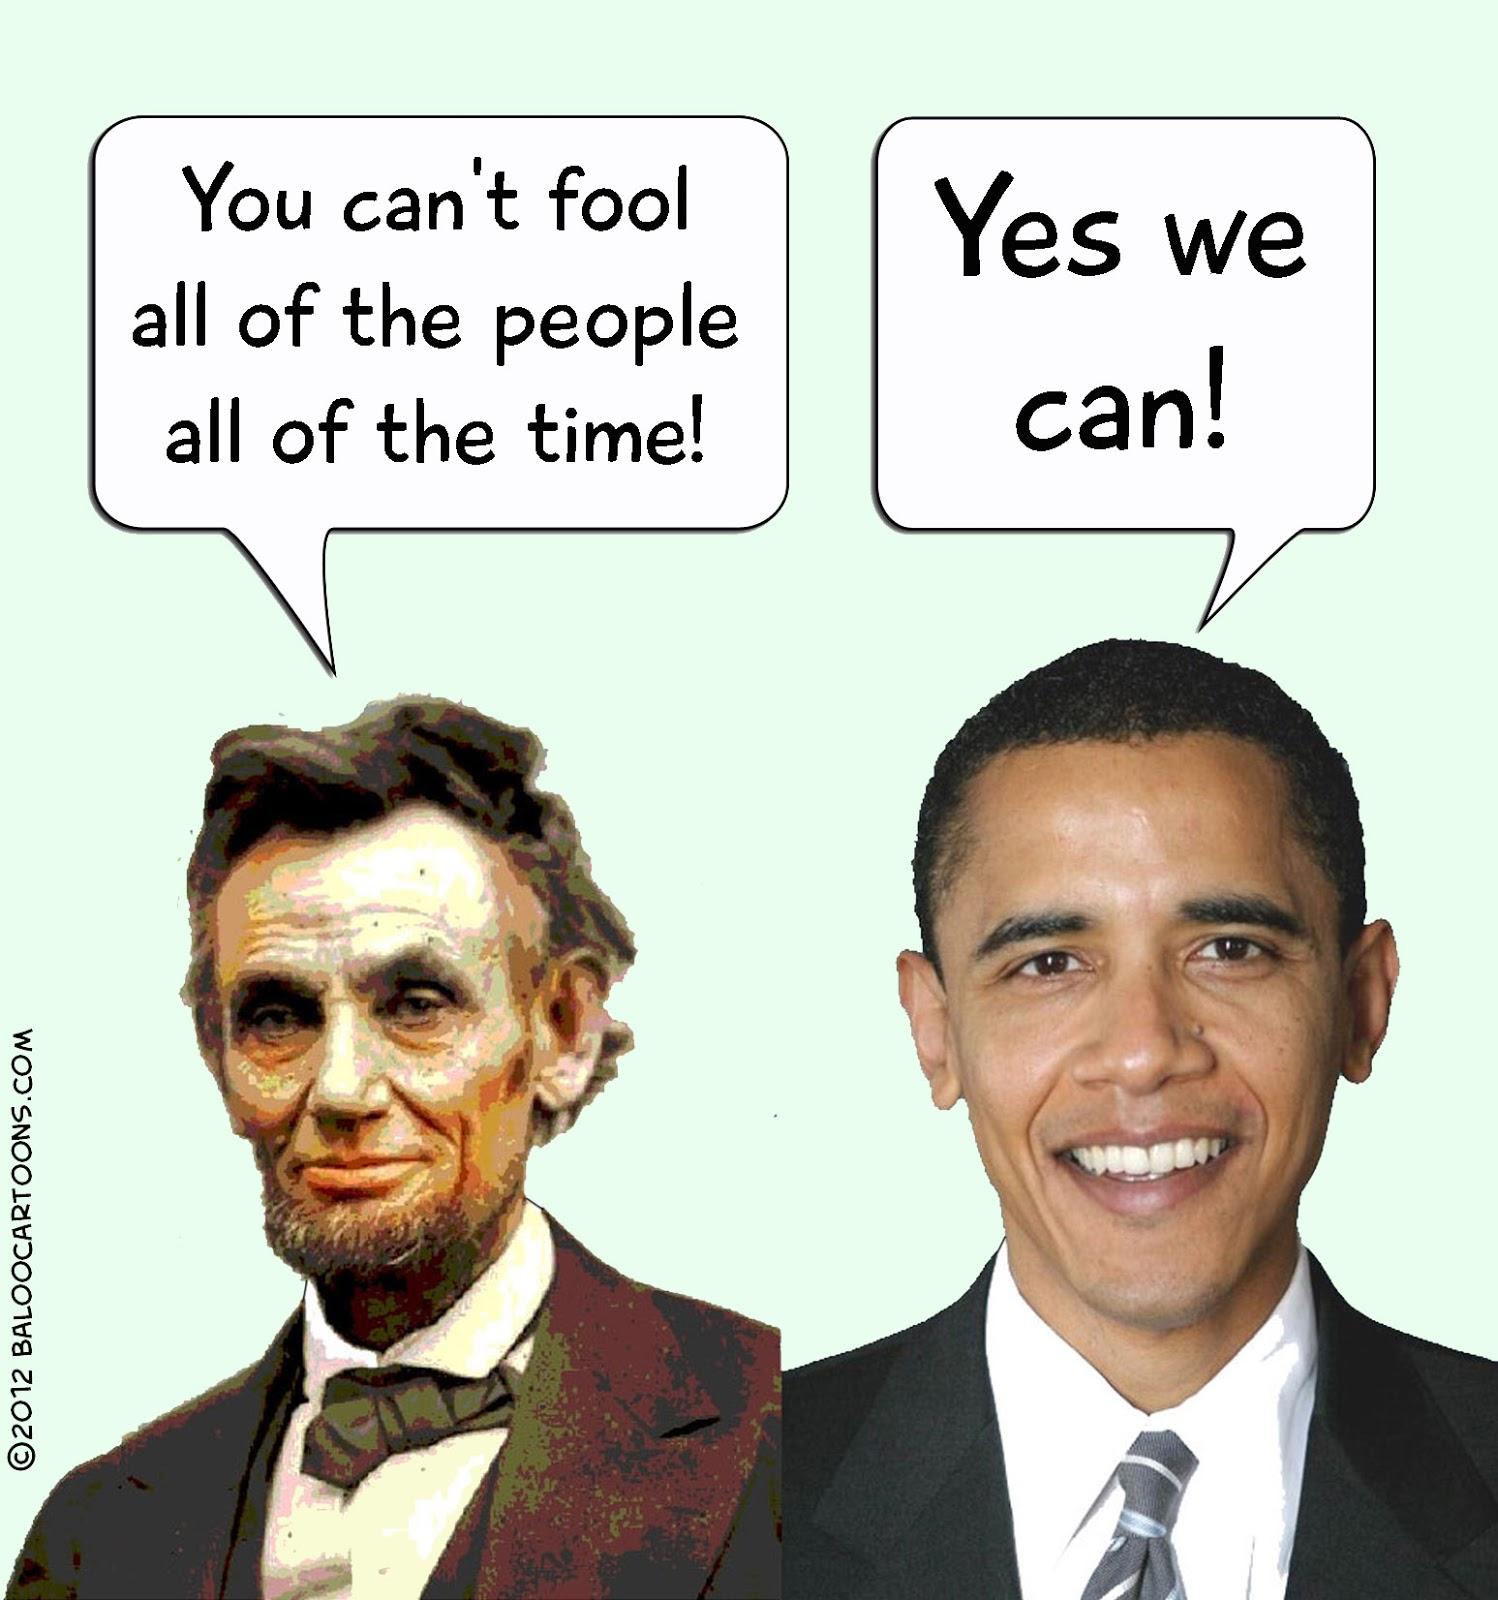 Baloo S Cartoon Blog Obama Lincoln Cartoon